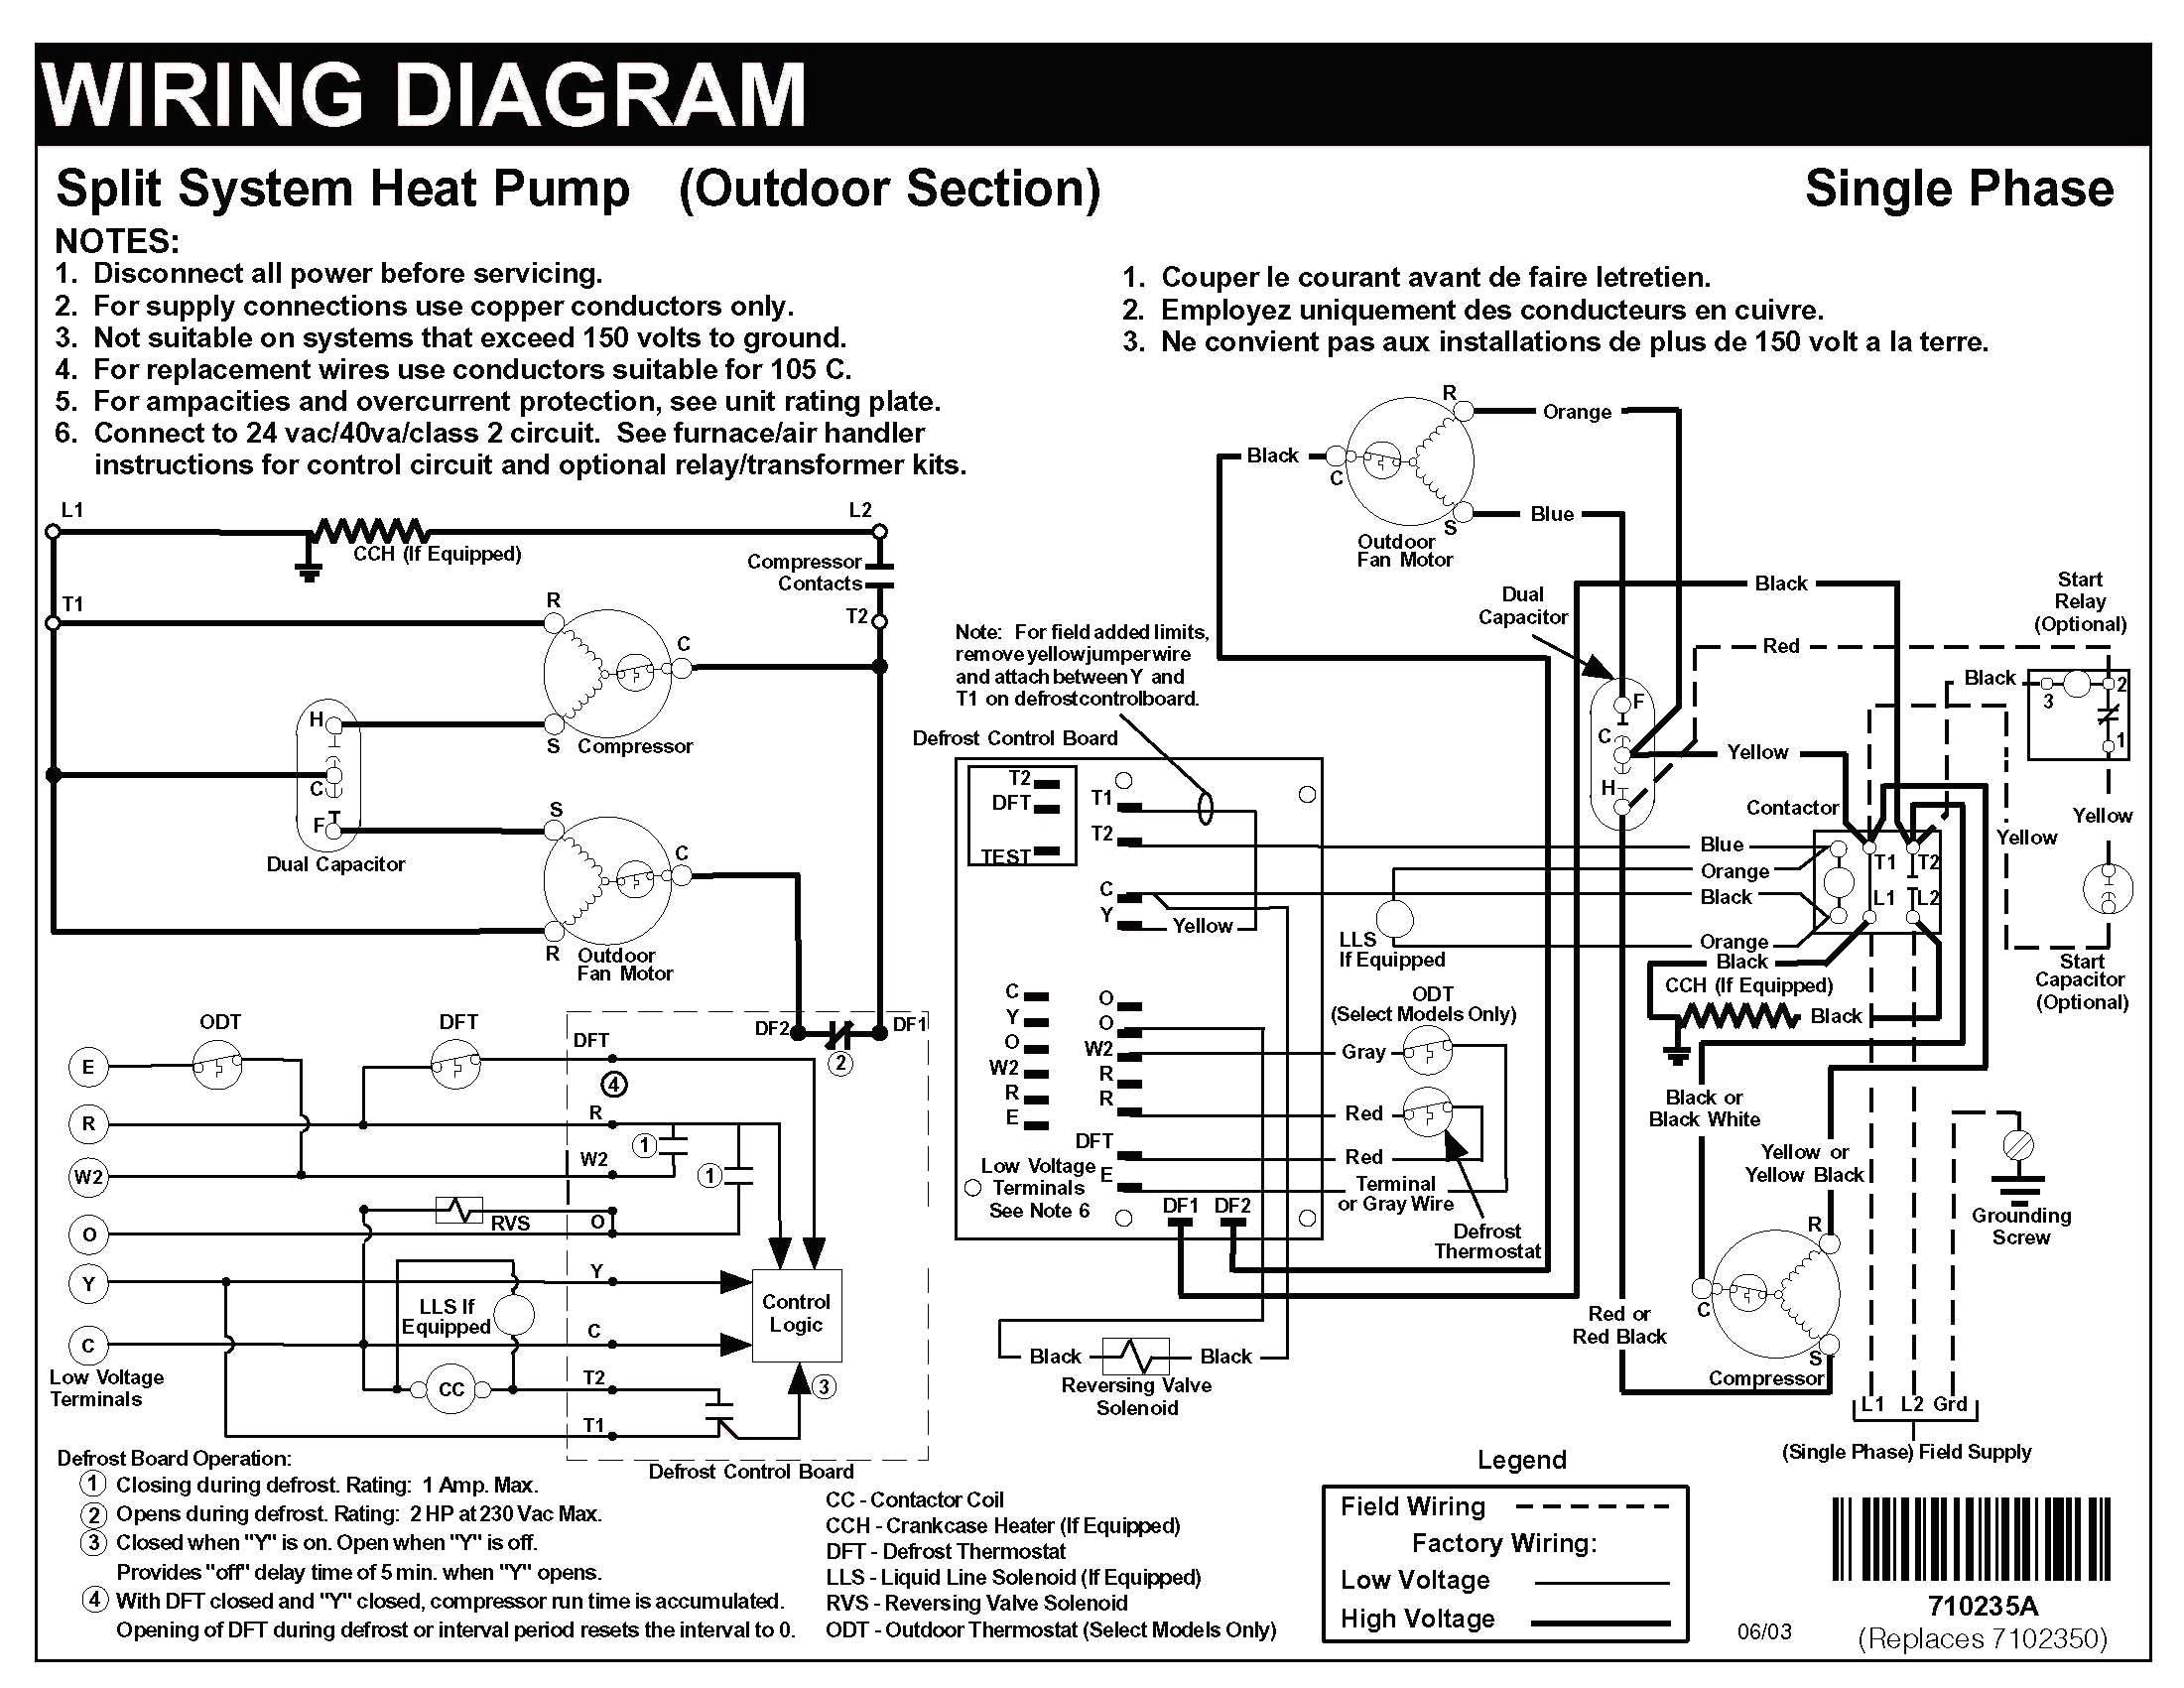 XW_9814] Wiring Diagram Likewise Heat Pump Reversing Valve Diagram On Wiring  A Download DiagramLotap Trofu Sapebe Mohammedshrine Librar Wiring 101